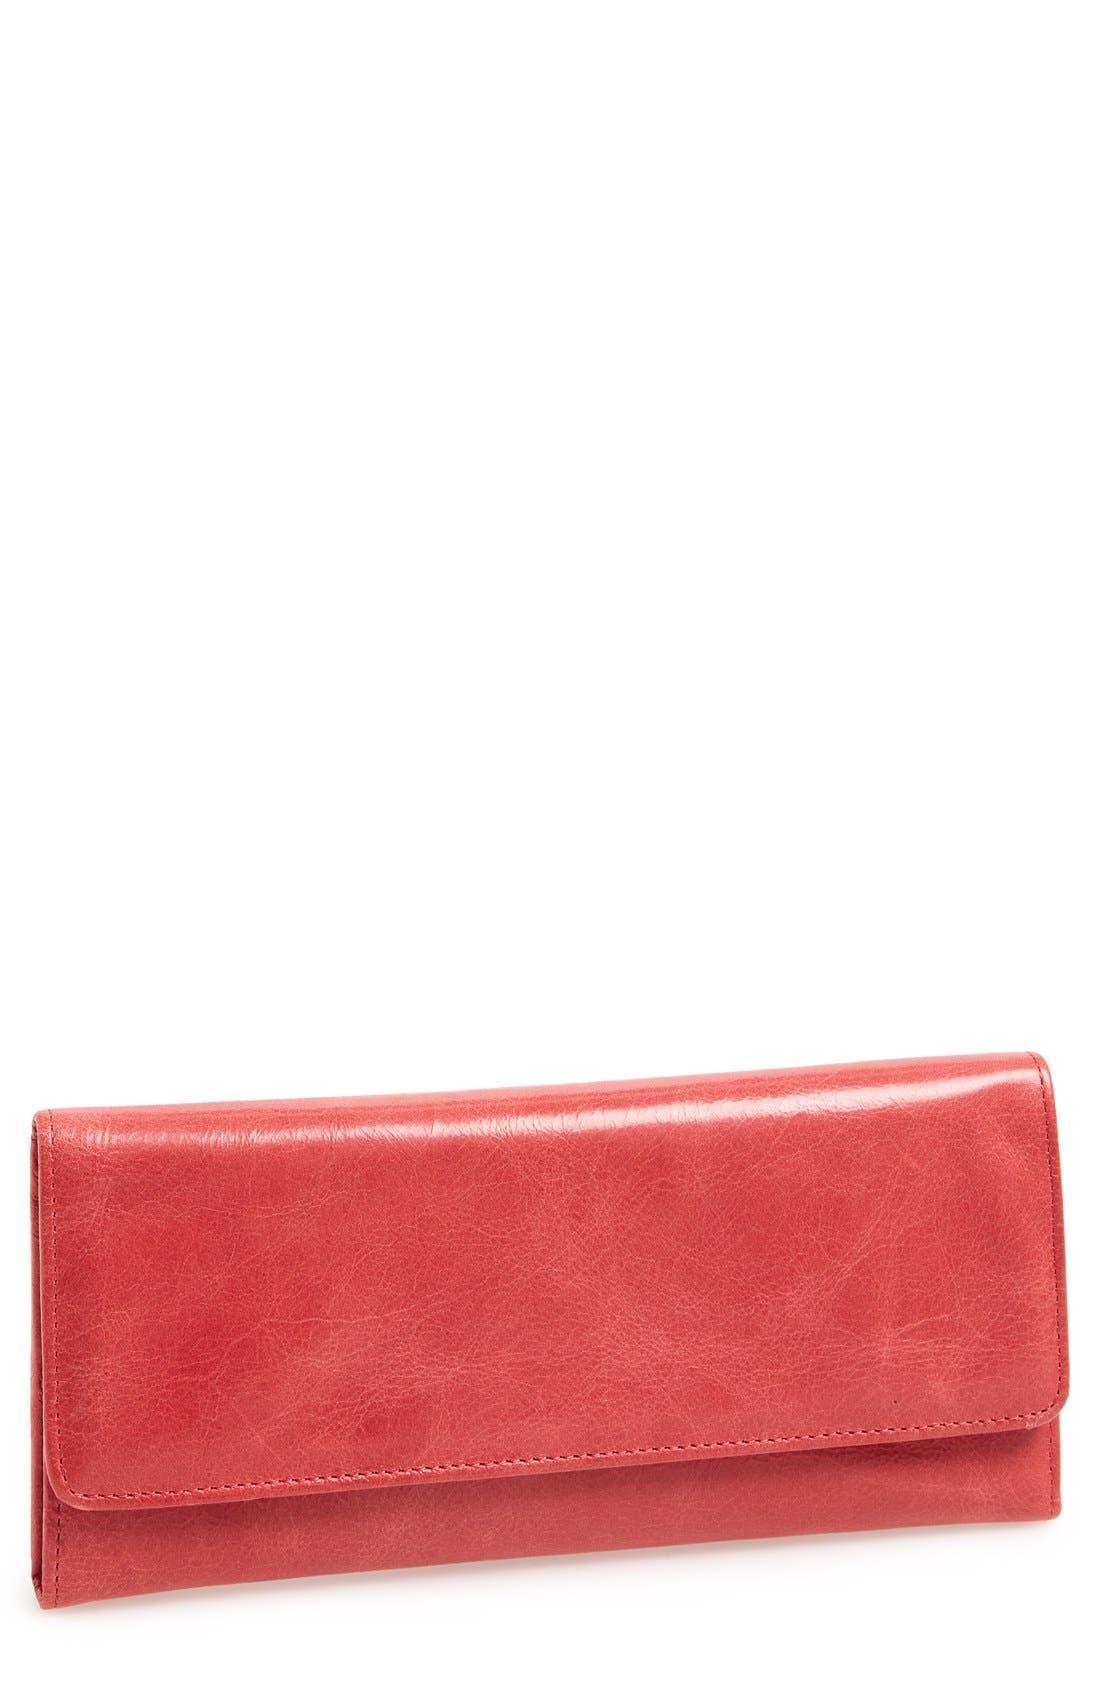 'Sadie' Leather Wallet,                             Main thumbnail 62, color,